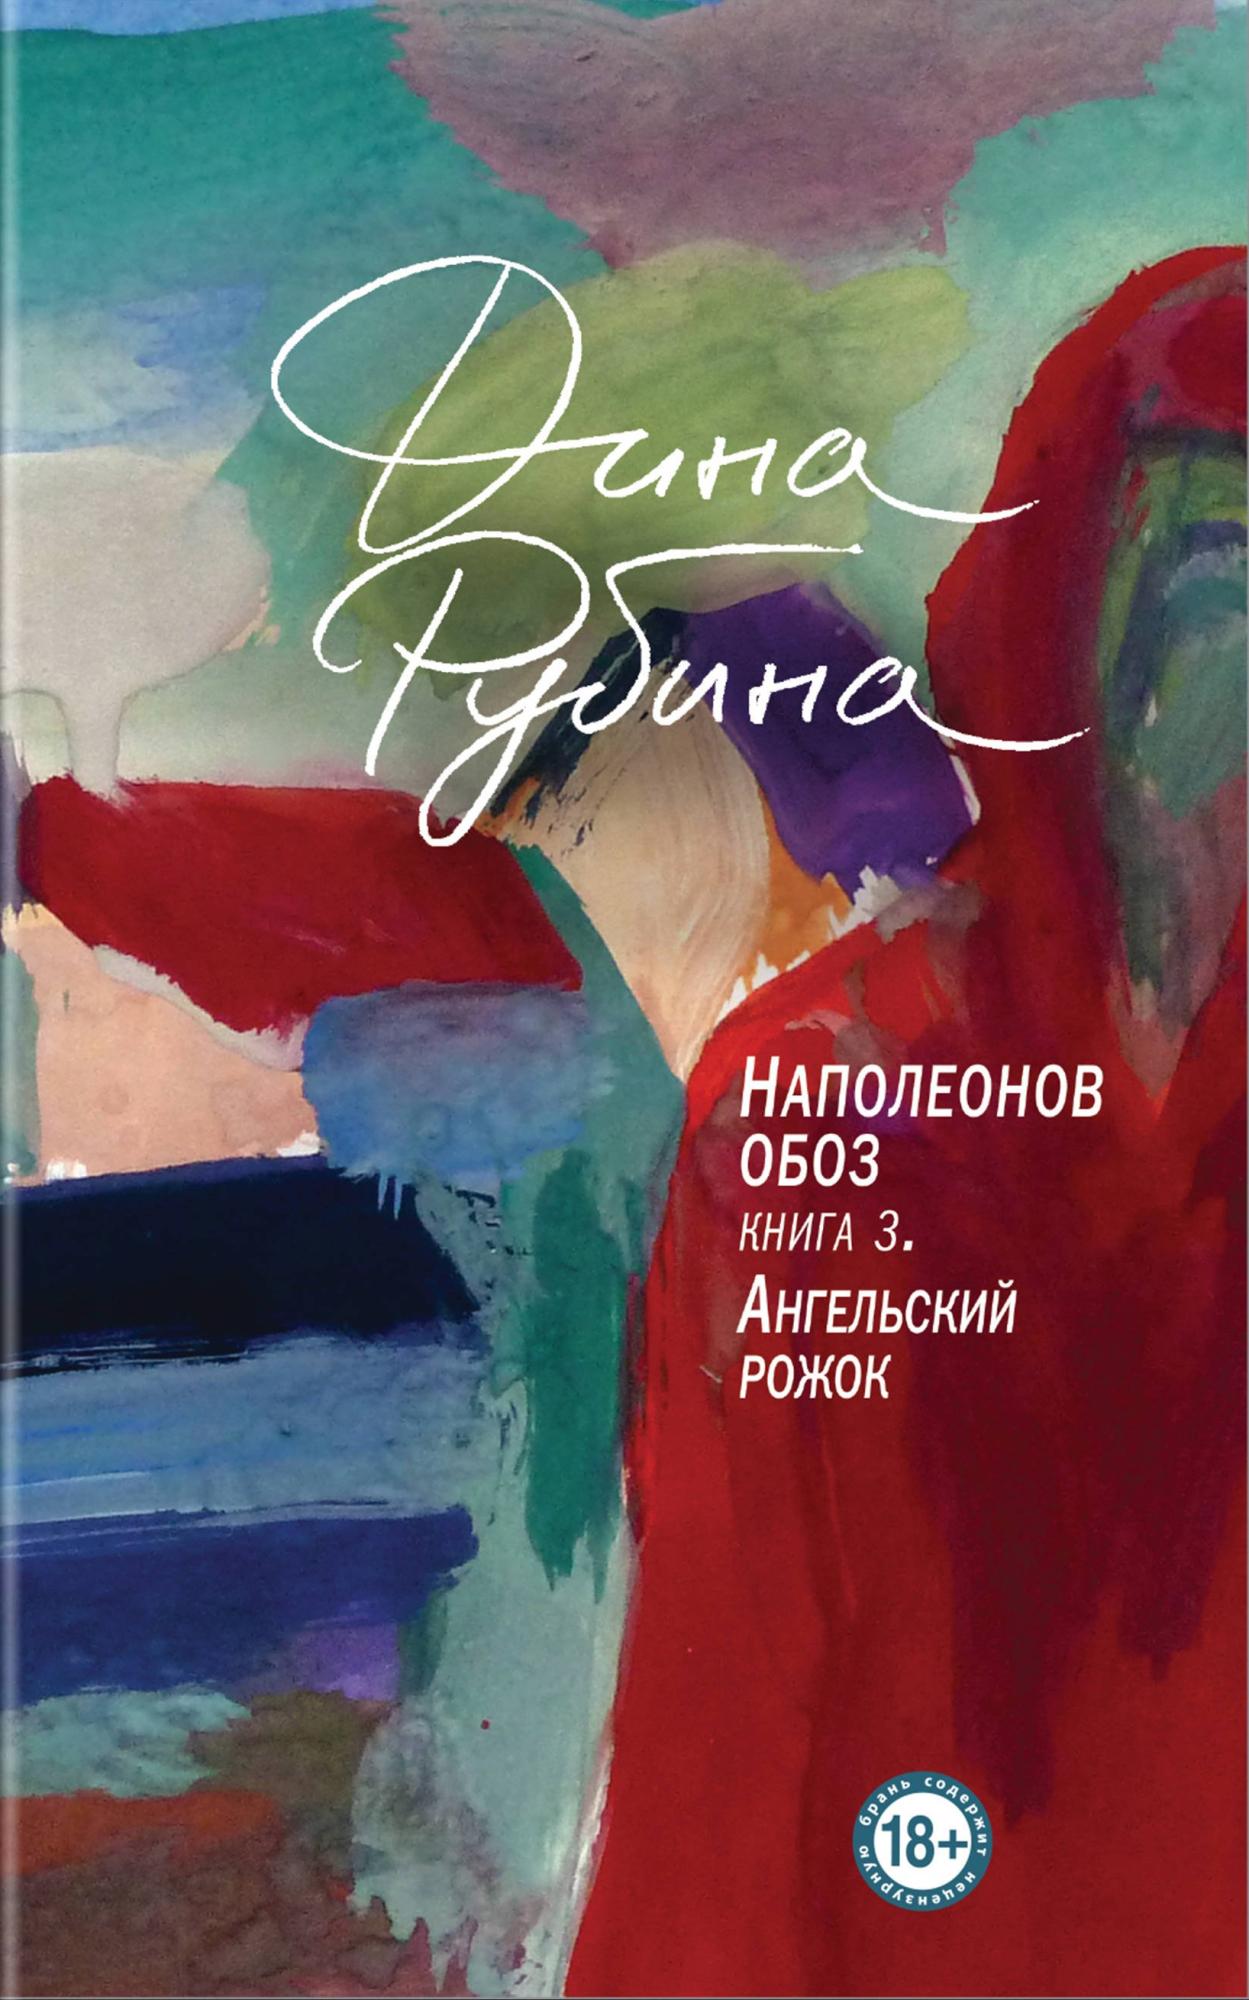 http://chelib.ru/wp-content/uploads/img/books/rubina-napoleonov-oboz-angelskiy-rozhok.jpg